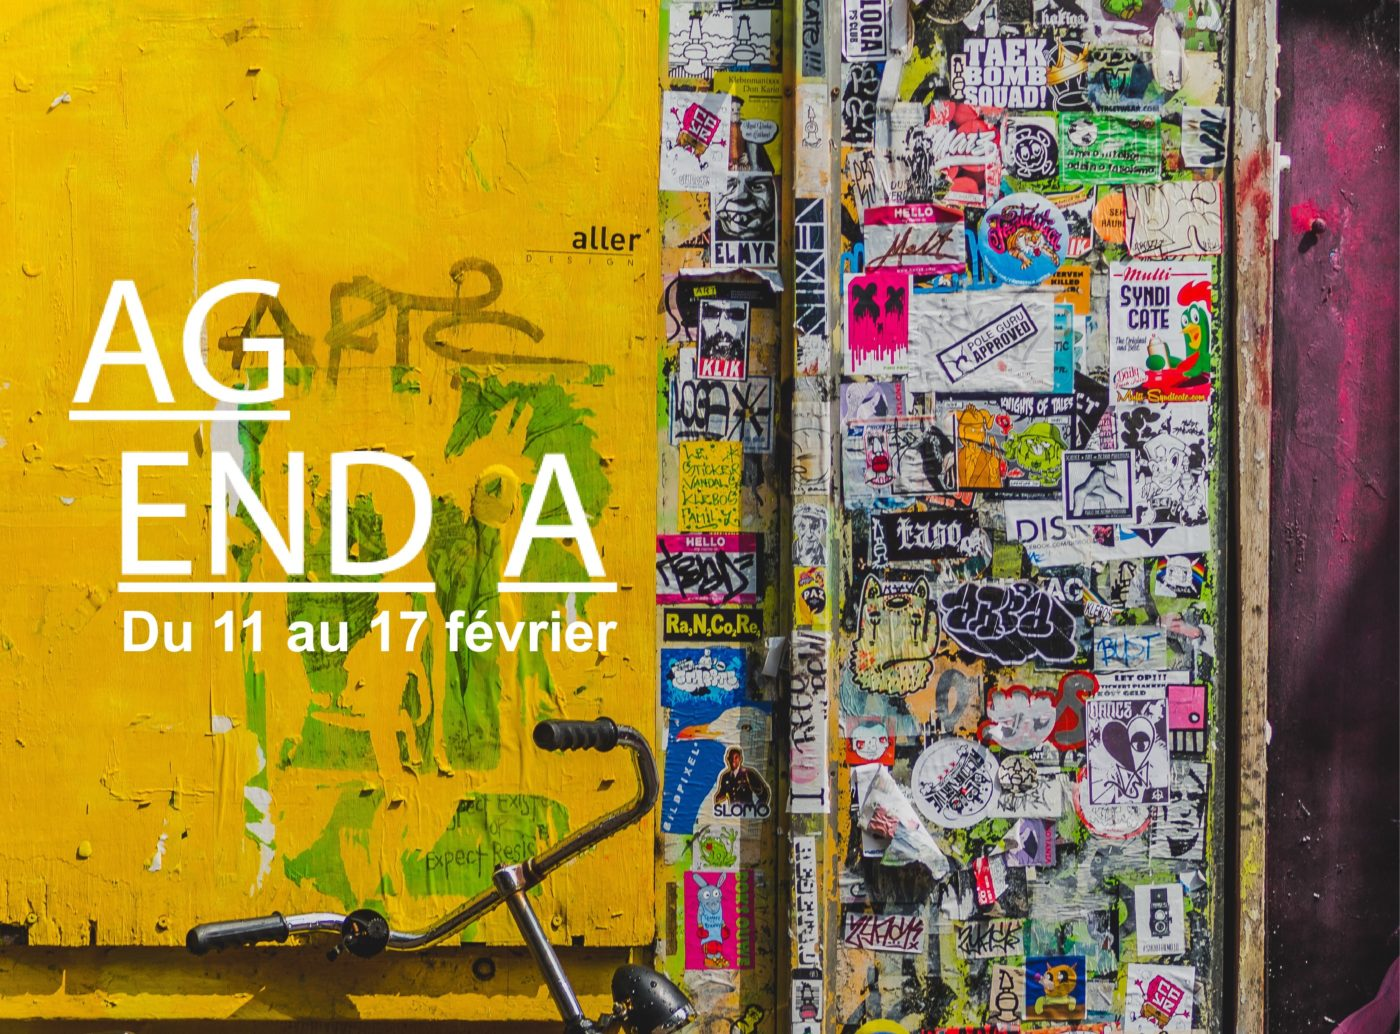 Agenda culturel de la semaine (11 > 17 février)